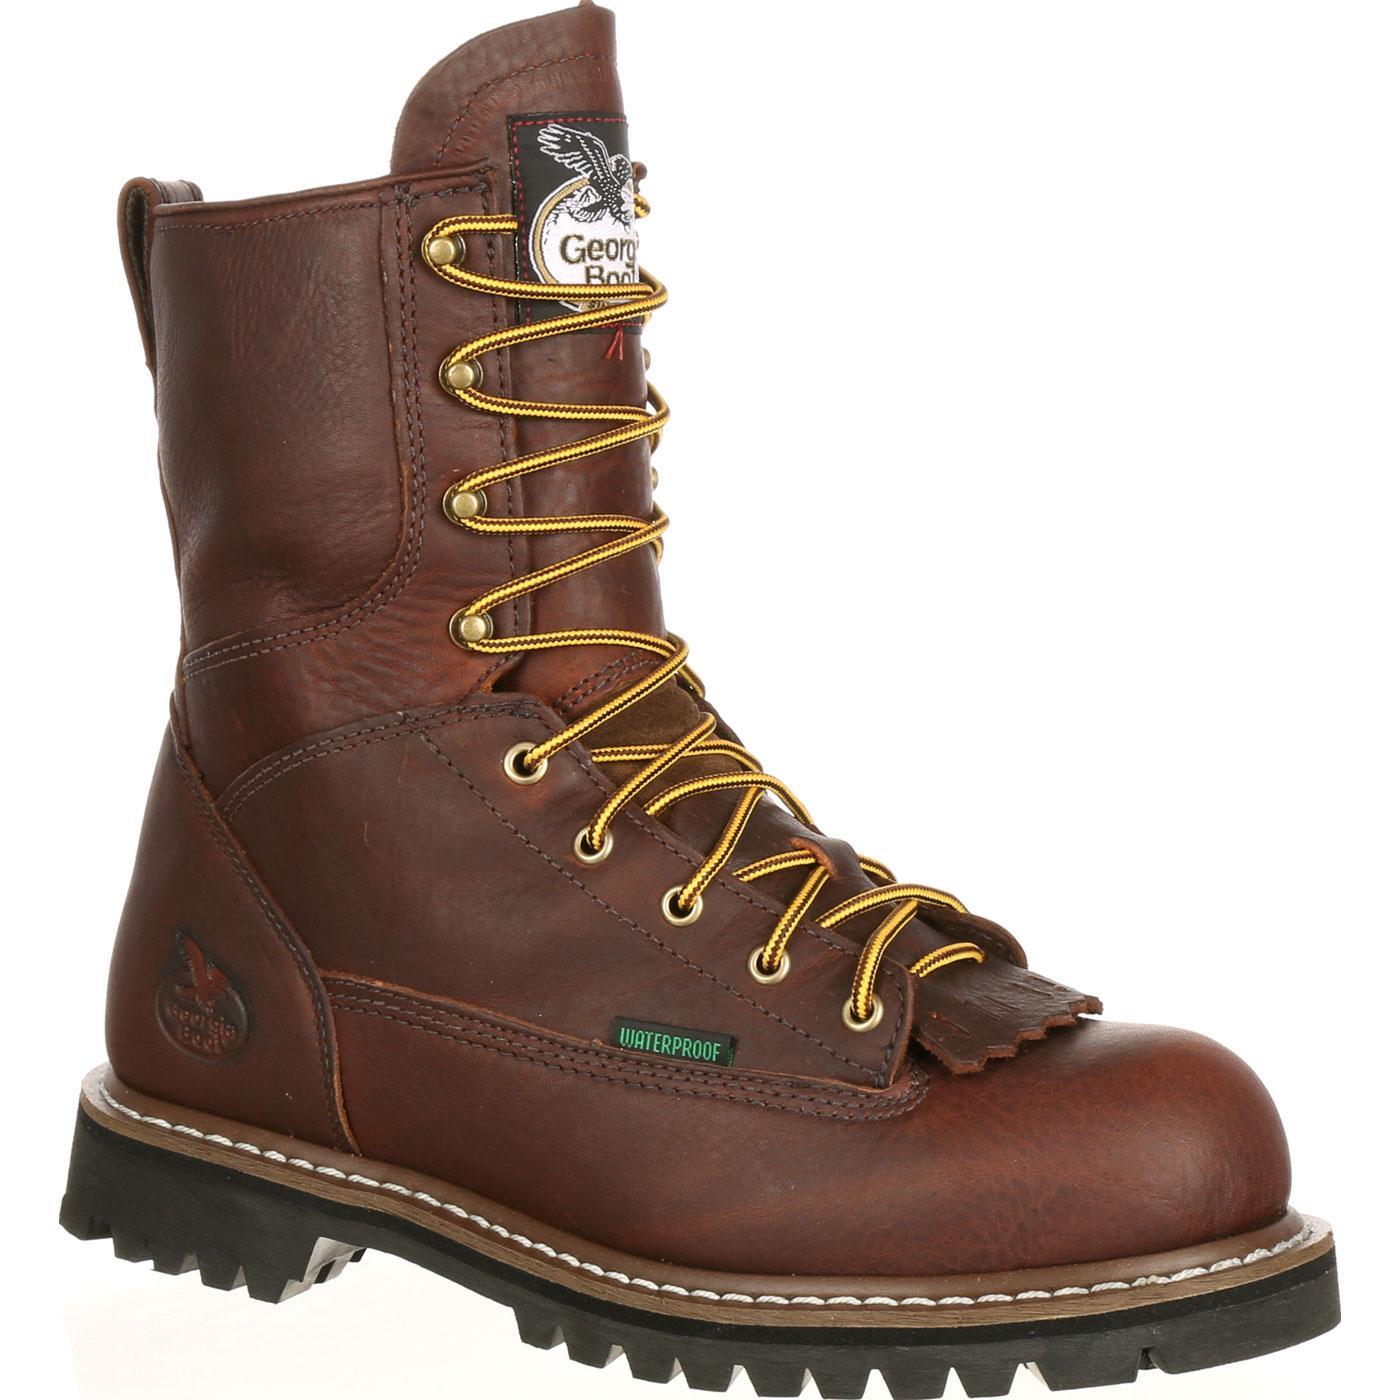 Georgia Steel Toe Waterproof Lace To Toe Work Boot G103